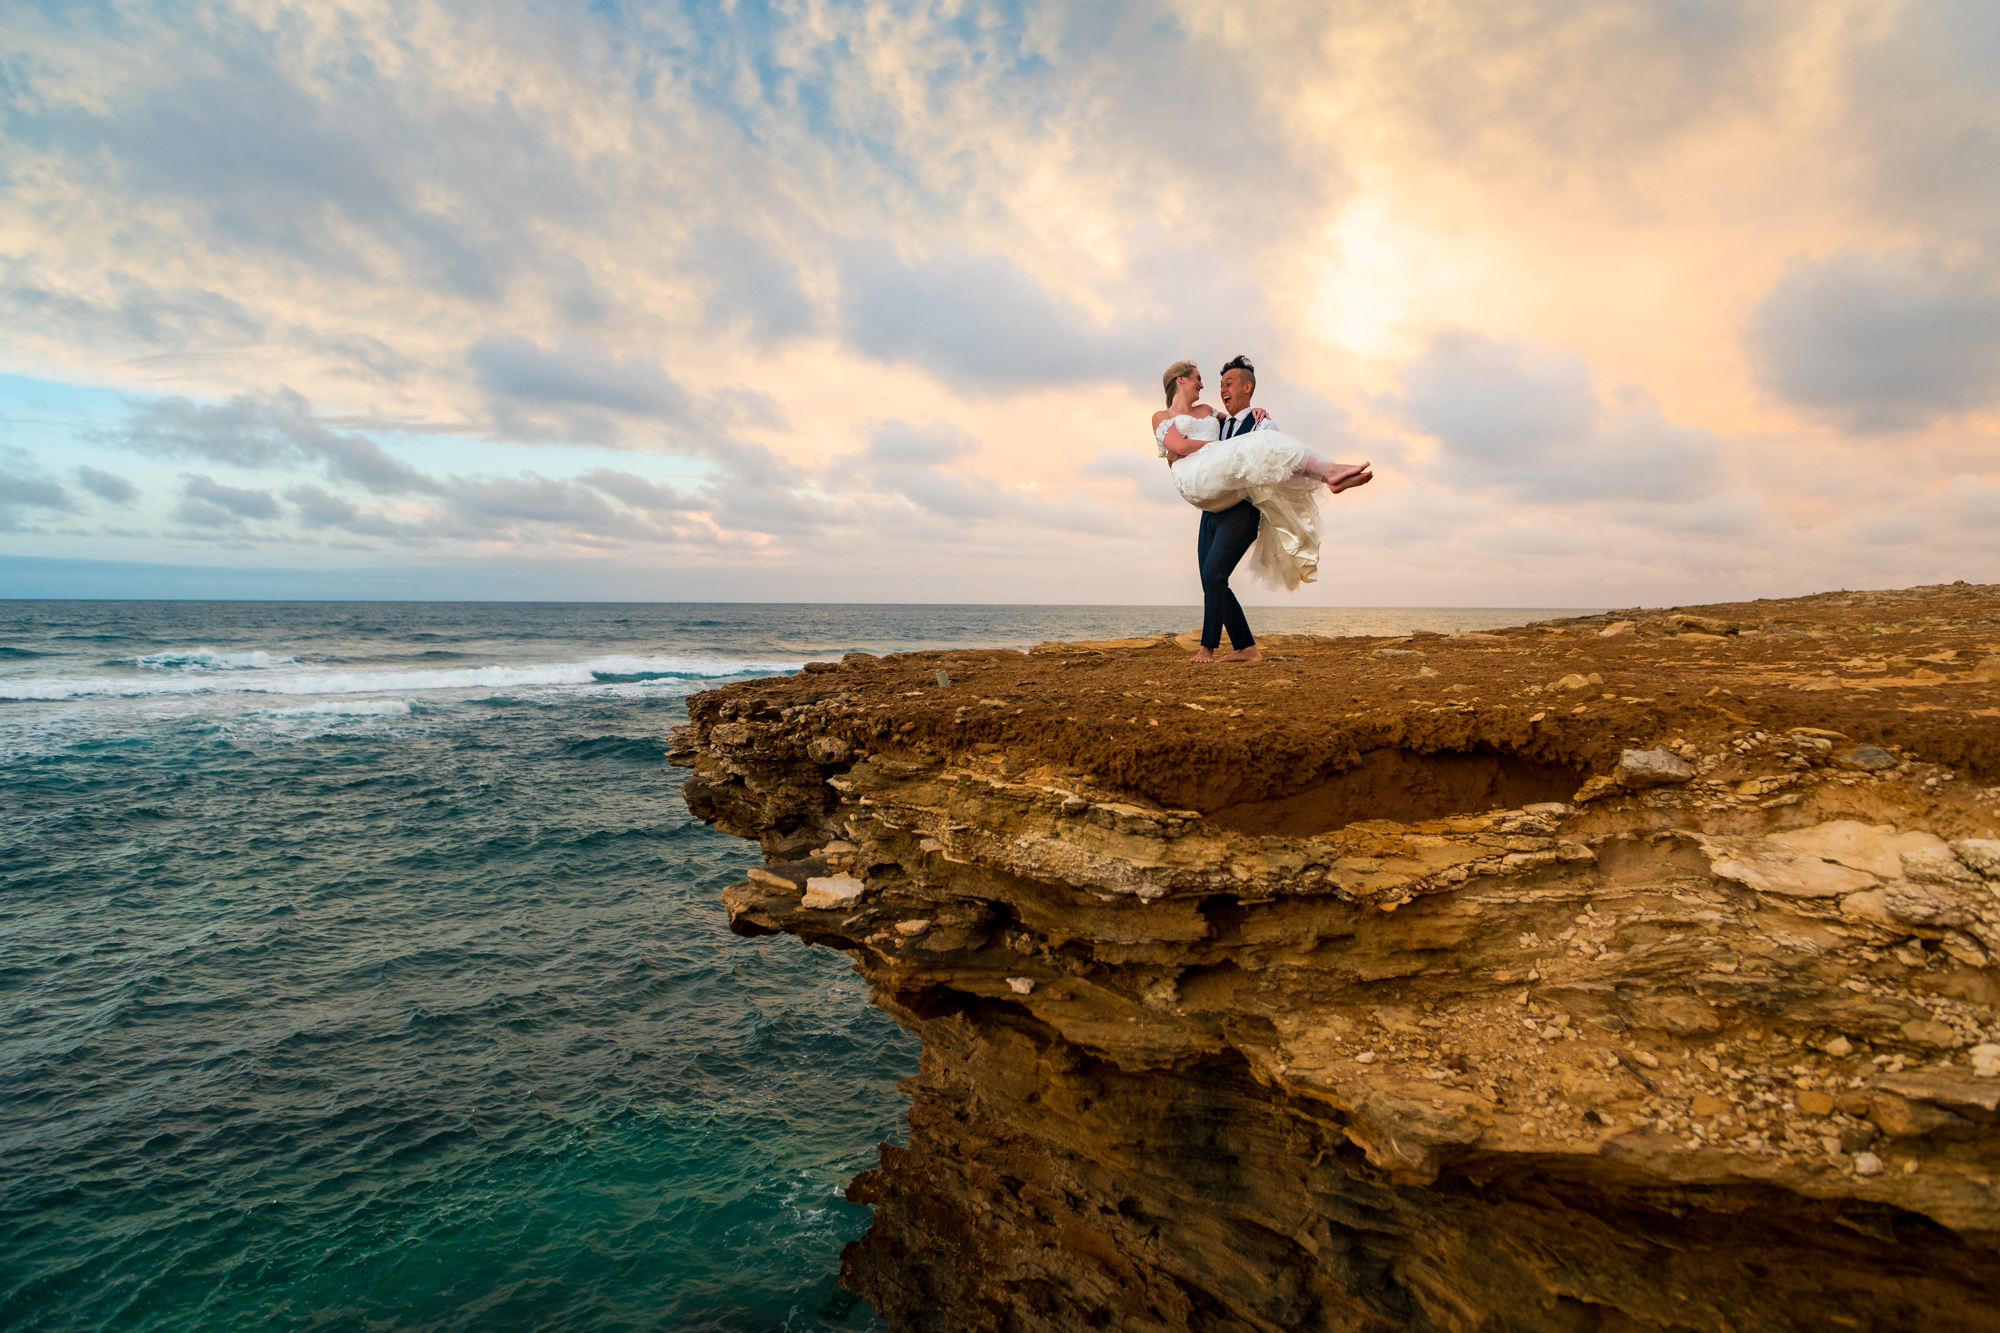 sunrise-wedding-coleen-shipwrecks-6-29-2919-9123.jpg